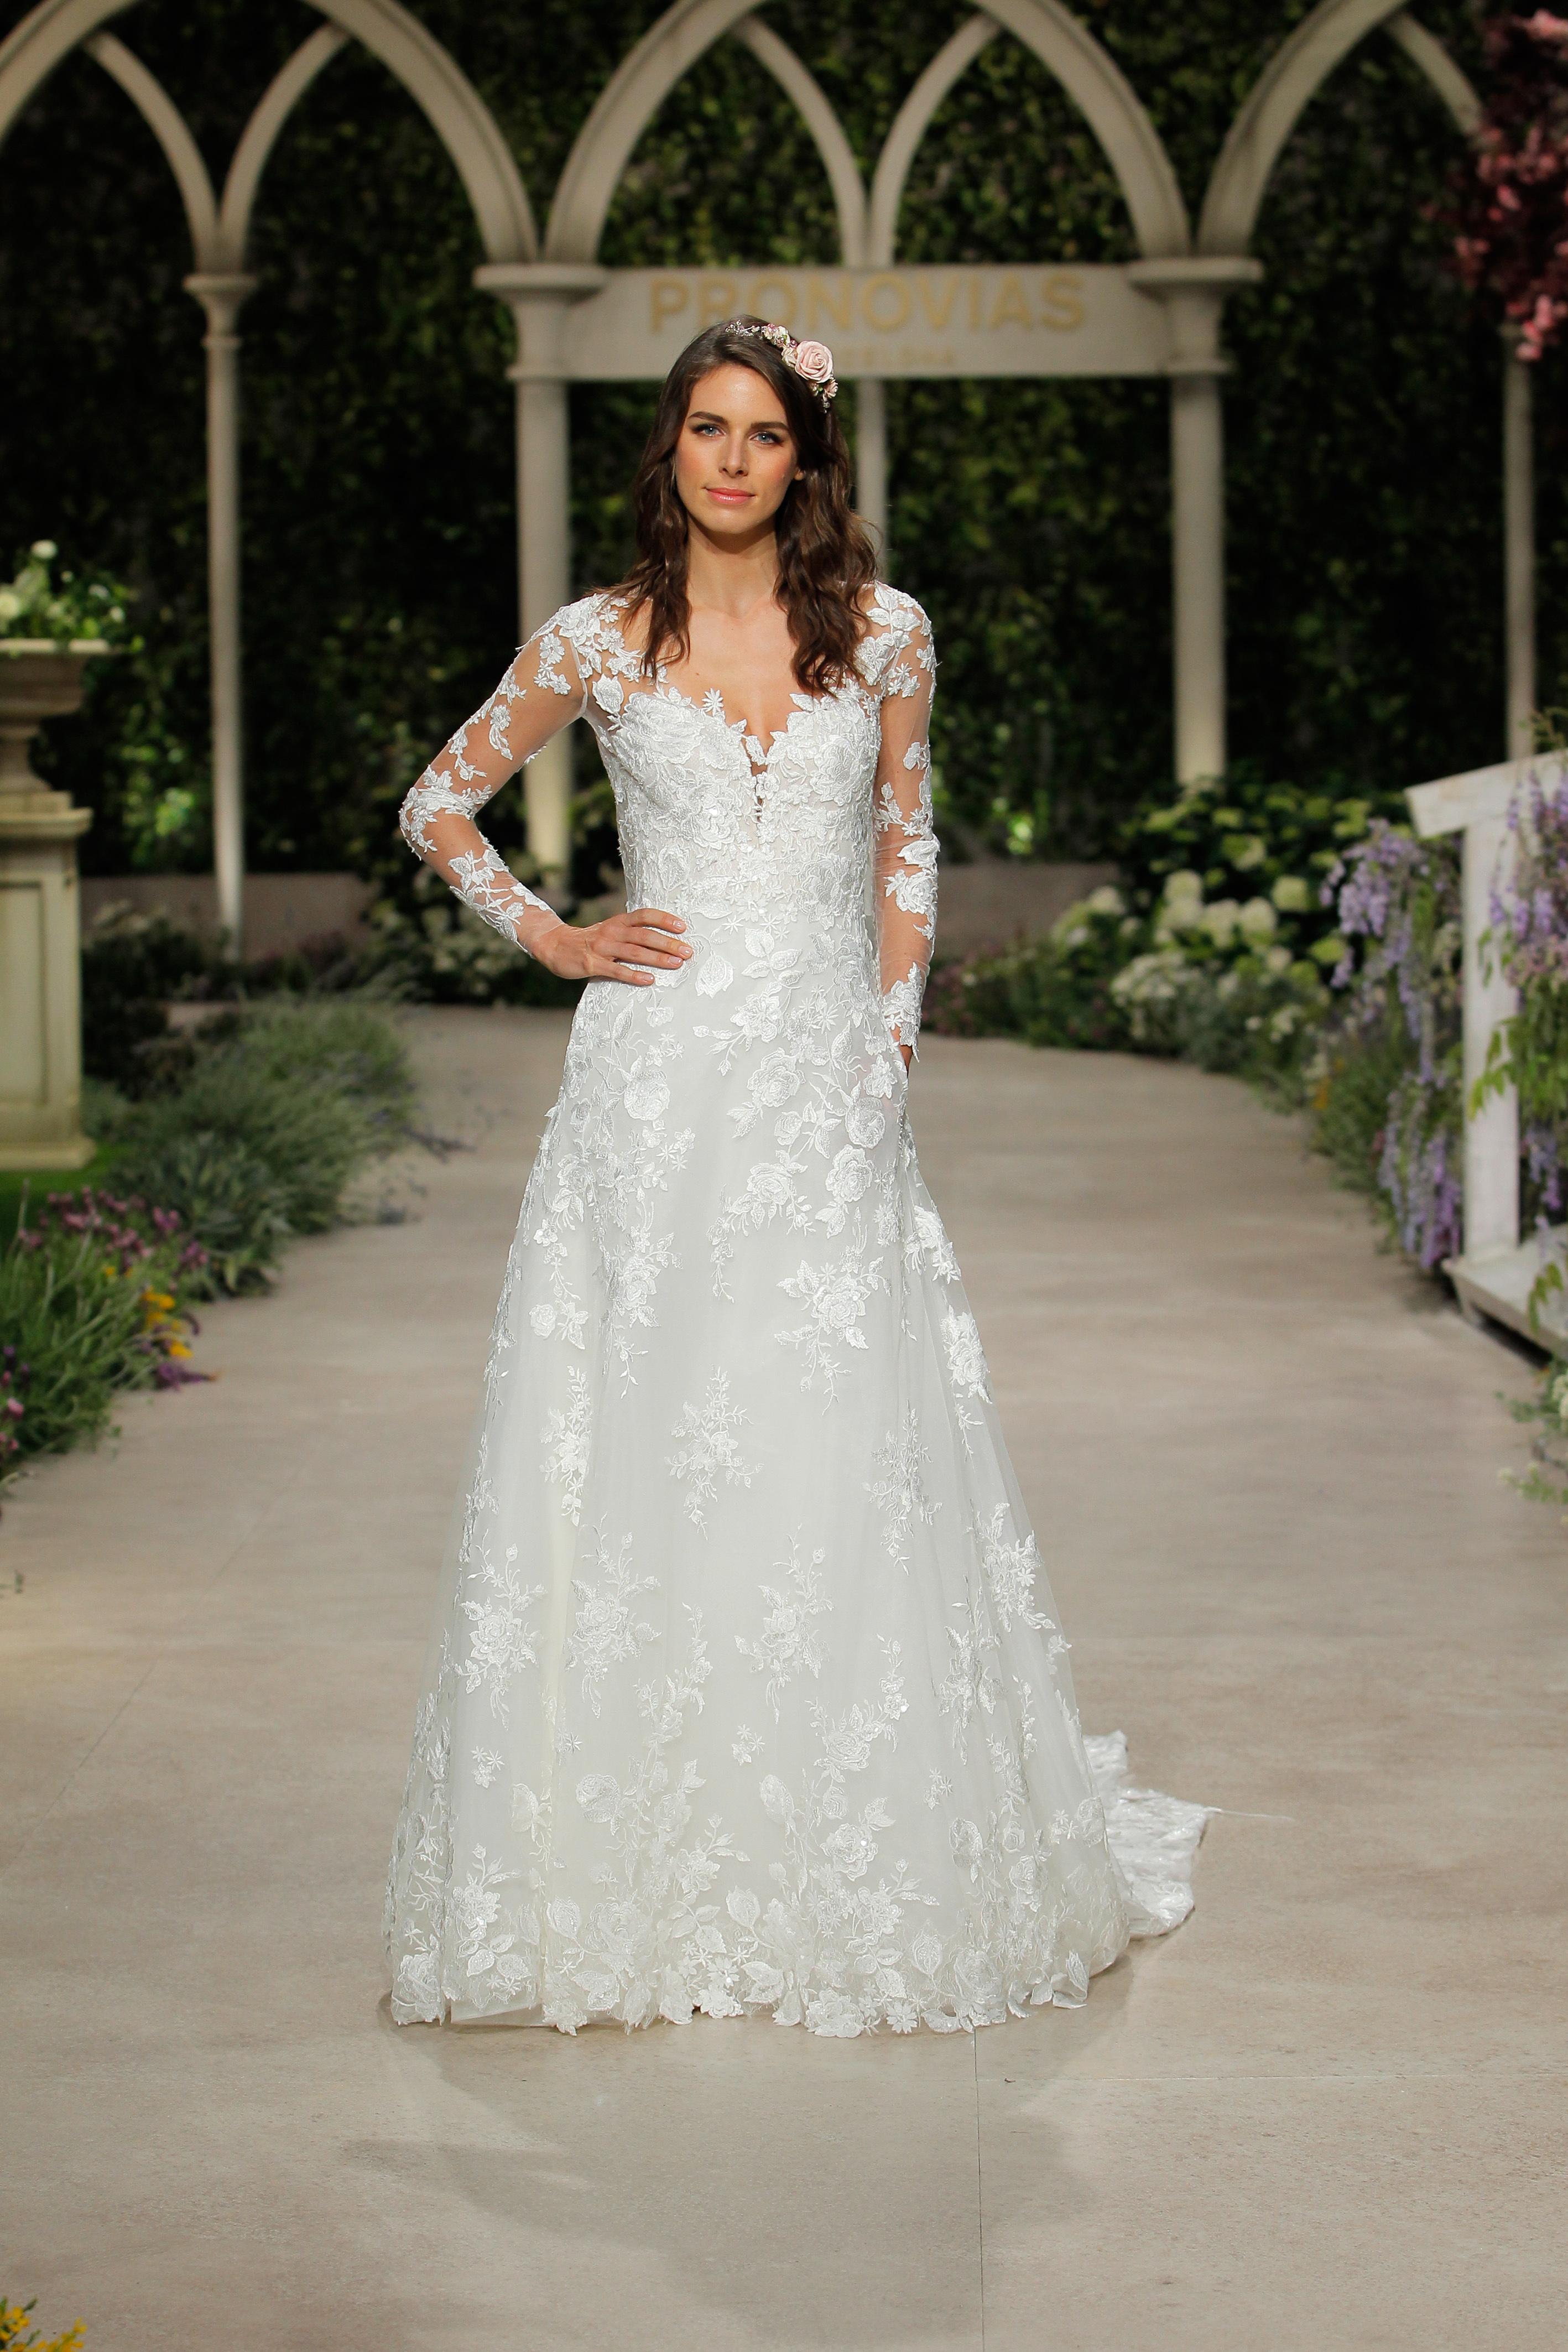 pronovias wedding dress spring 2019 long sleeve embroidered